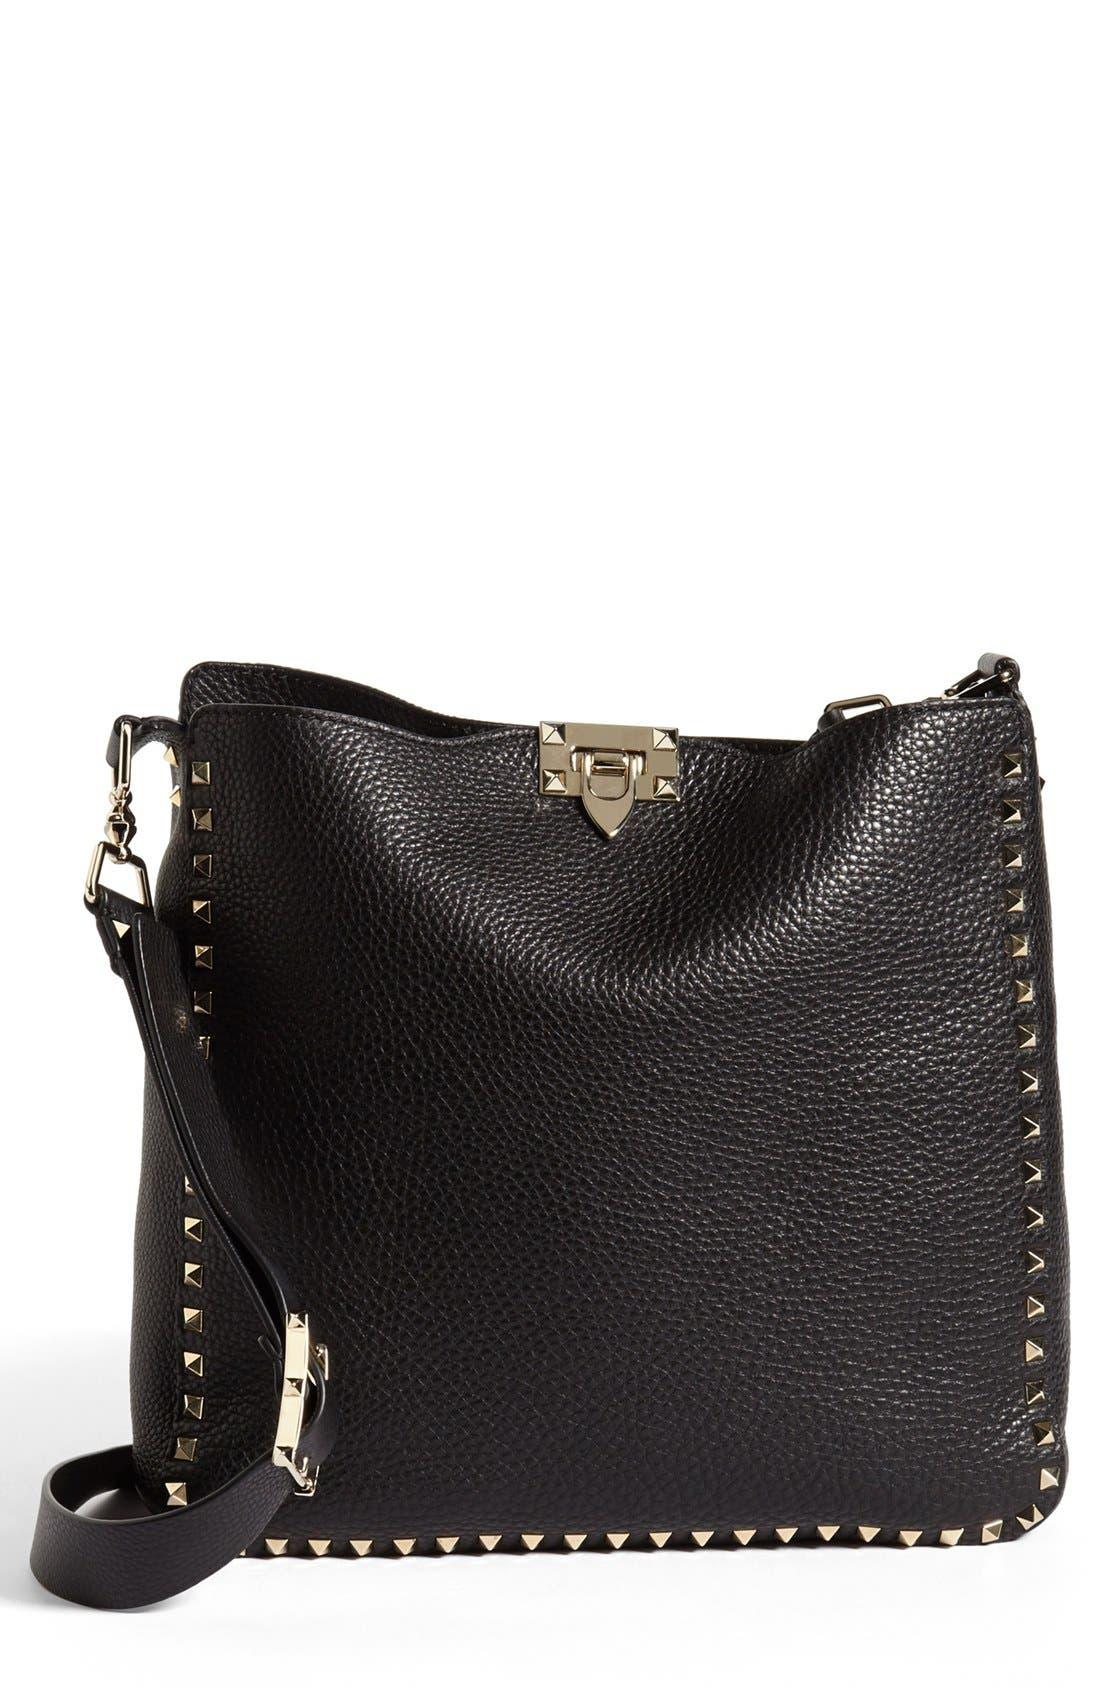 Main Image - Valentino 'Rockstud' Crossbody Bag